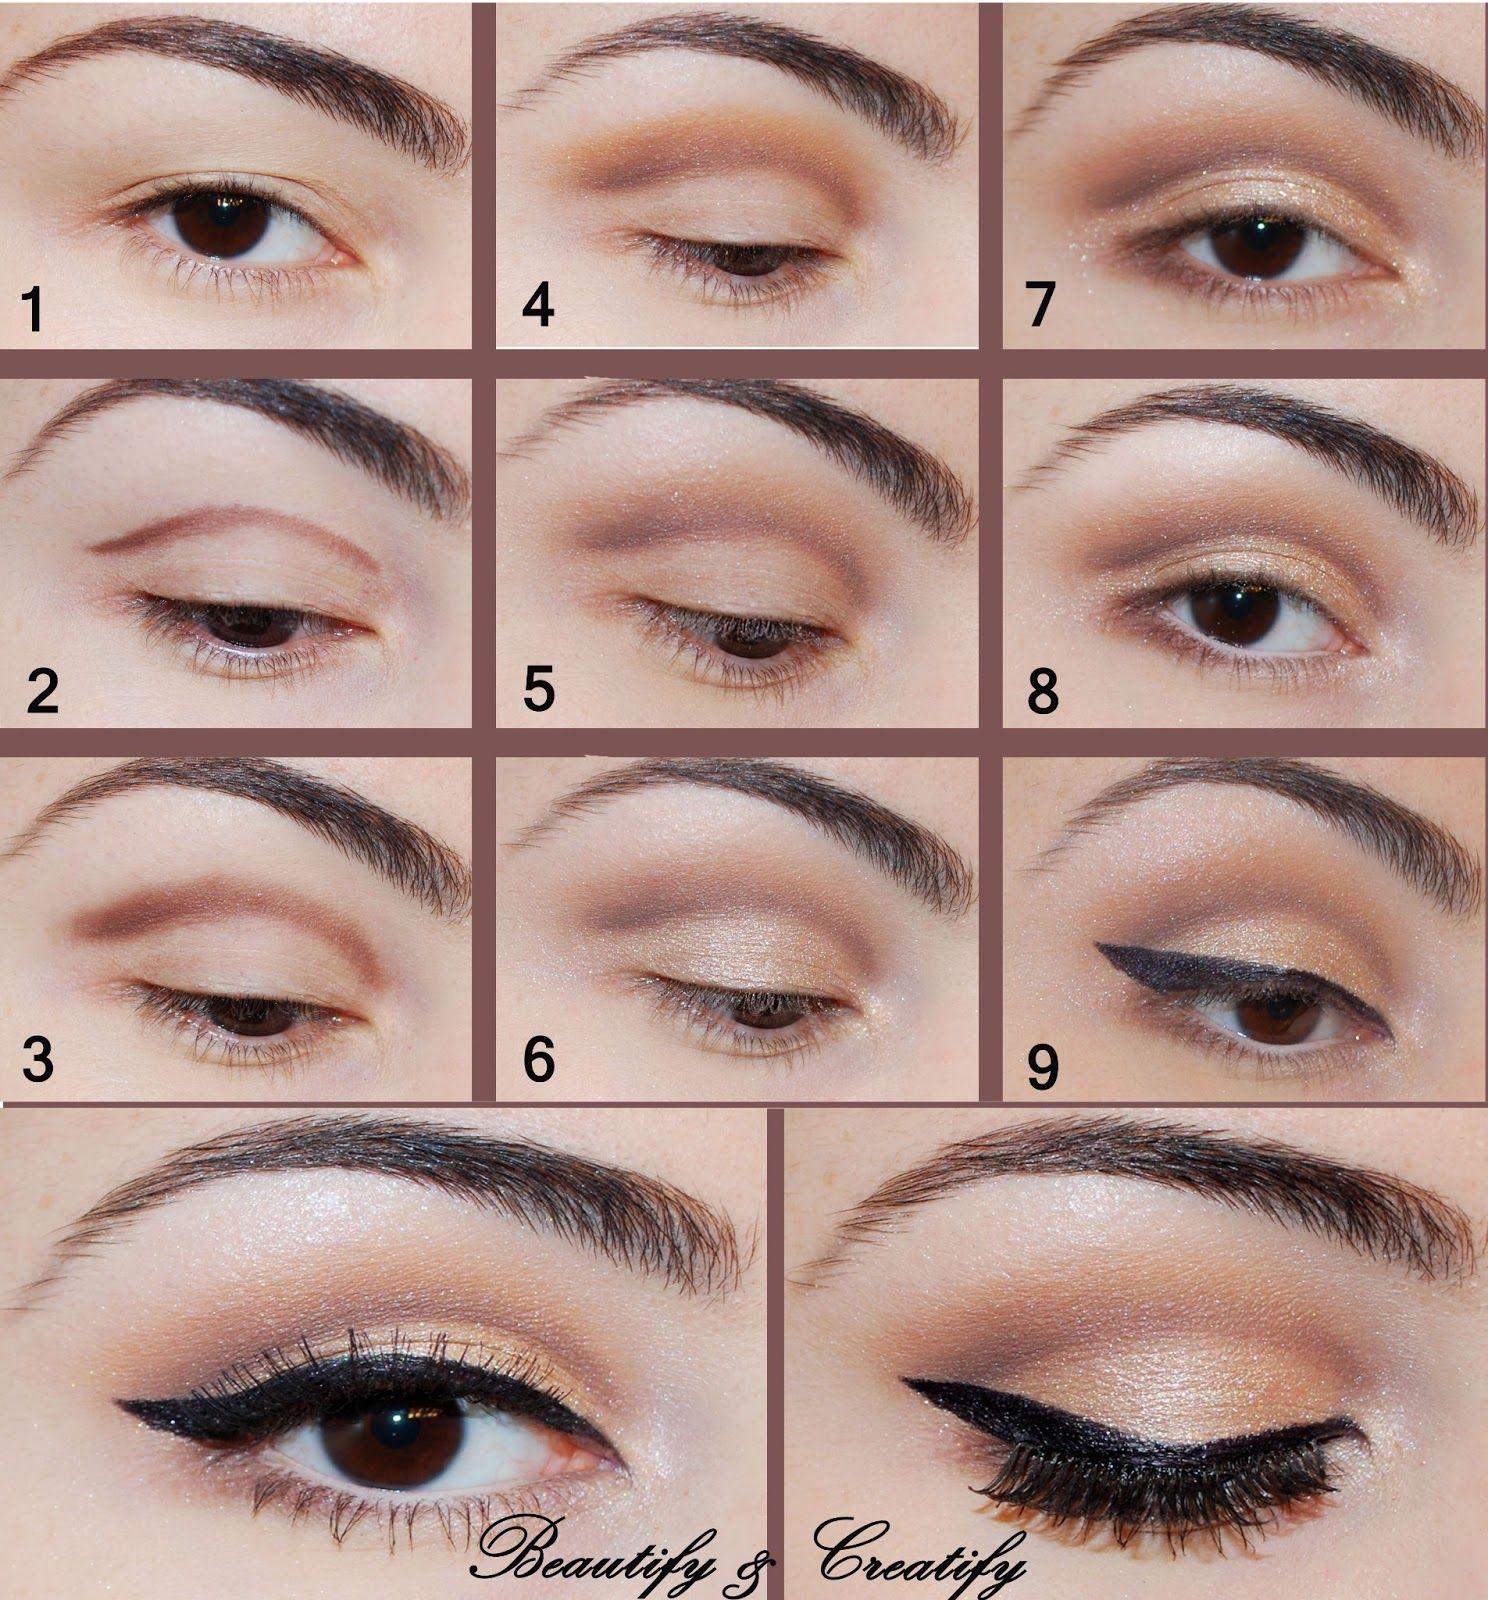 Simple is always better. The dark cream eye shadow blends ...